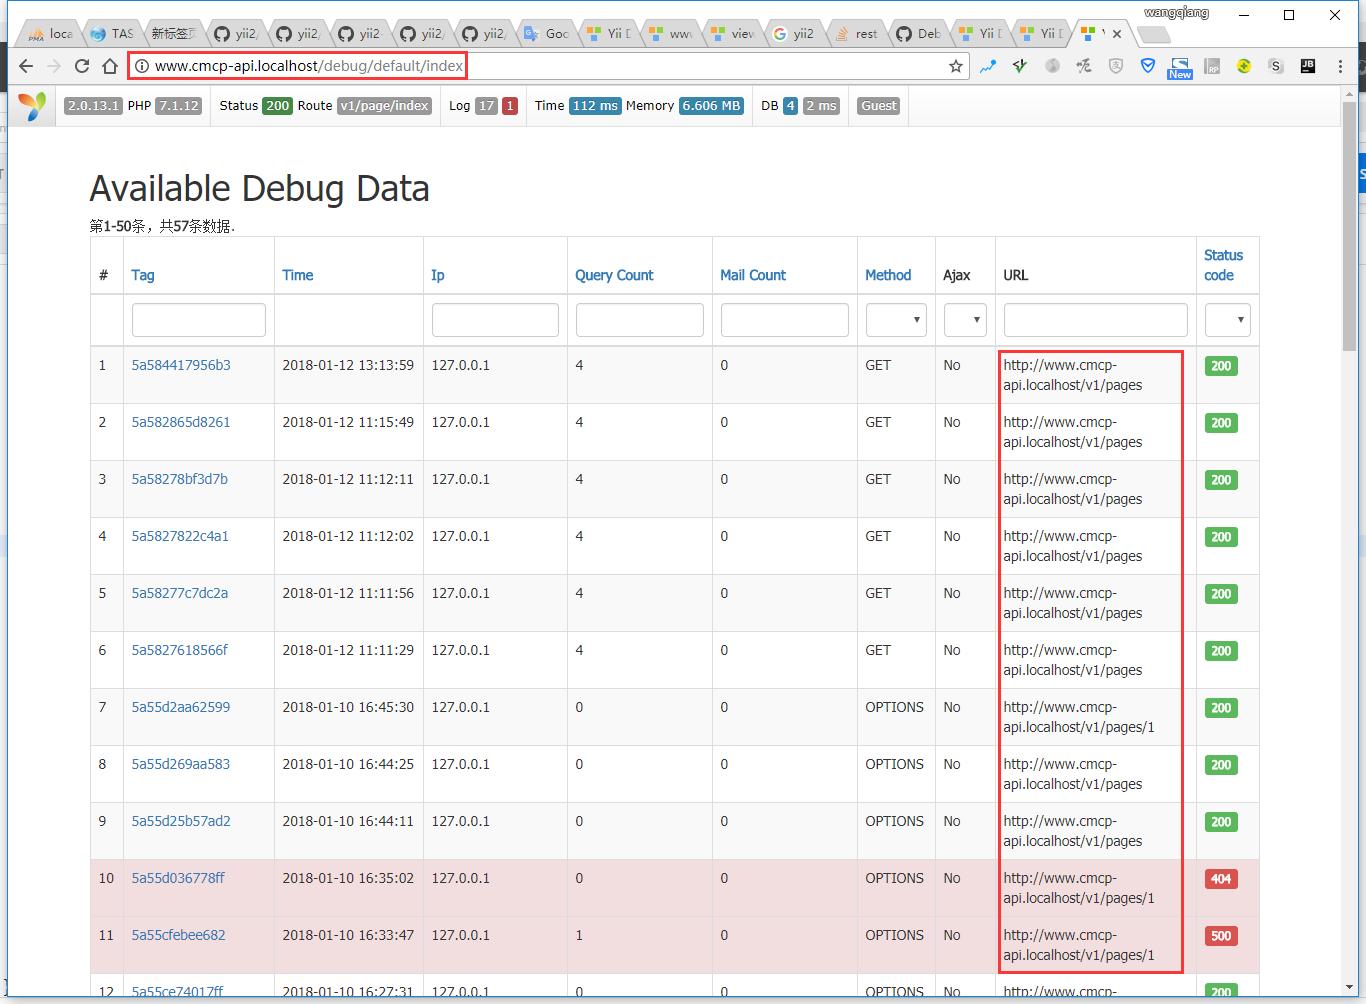 分析得出前端应用的调试器的网址,只需要将 frontend 替换为 www,便是接口应用的调试器的网址,打开:http://www.cmcp-api.localhost/debug/default/index